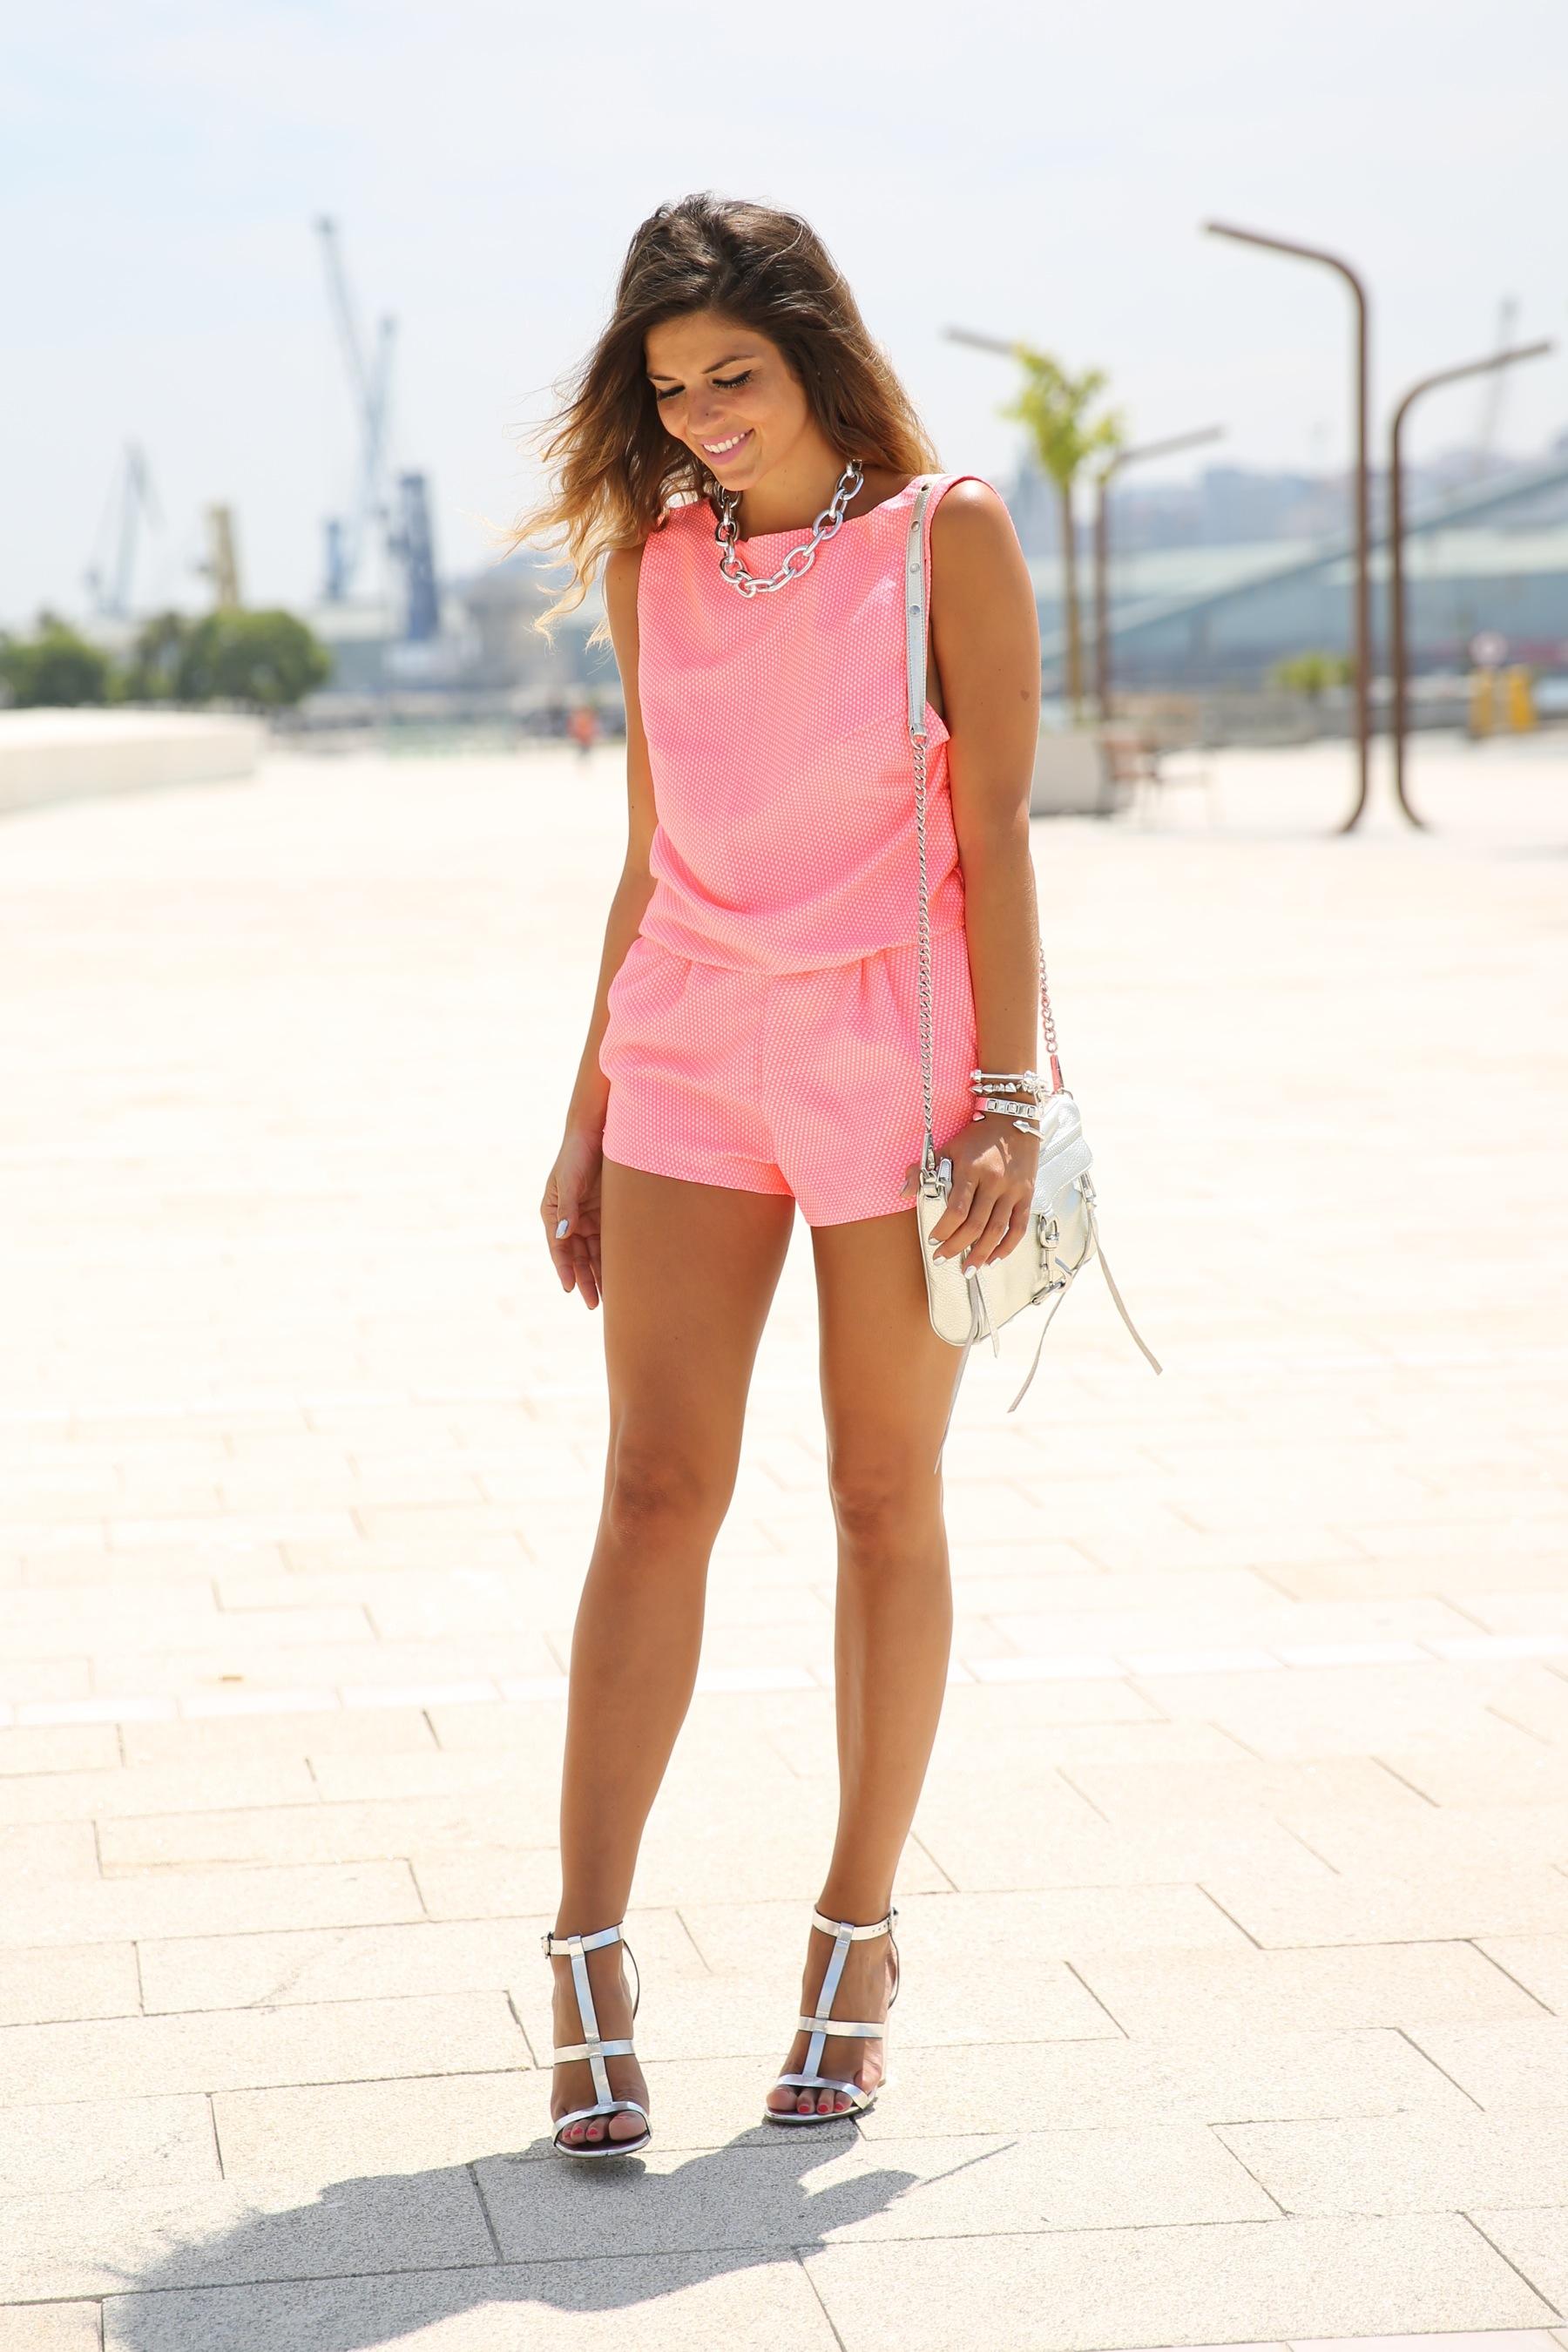 trendy_taste-look-outfit-street_style-ootd-blog-blogger-fashion_spain-moda_españa-silver_bag-bolso_plata-mono_rosa-mekdes-coruña-marina-11